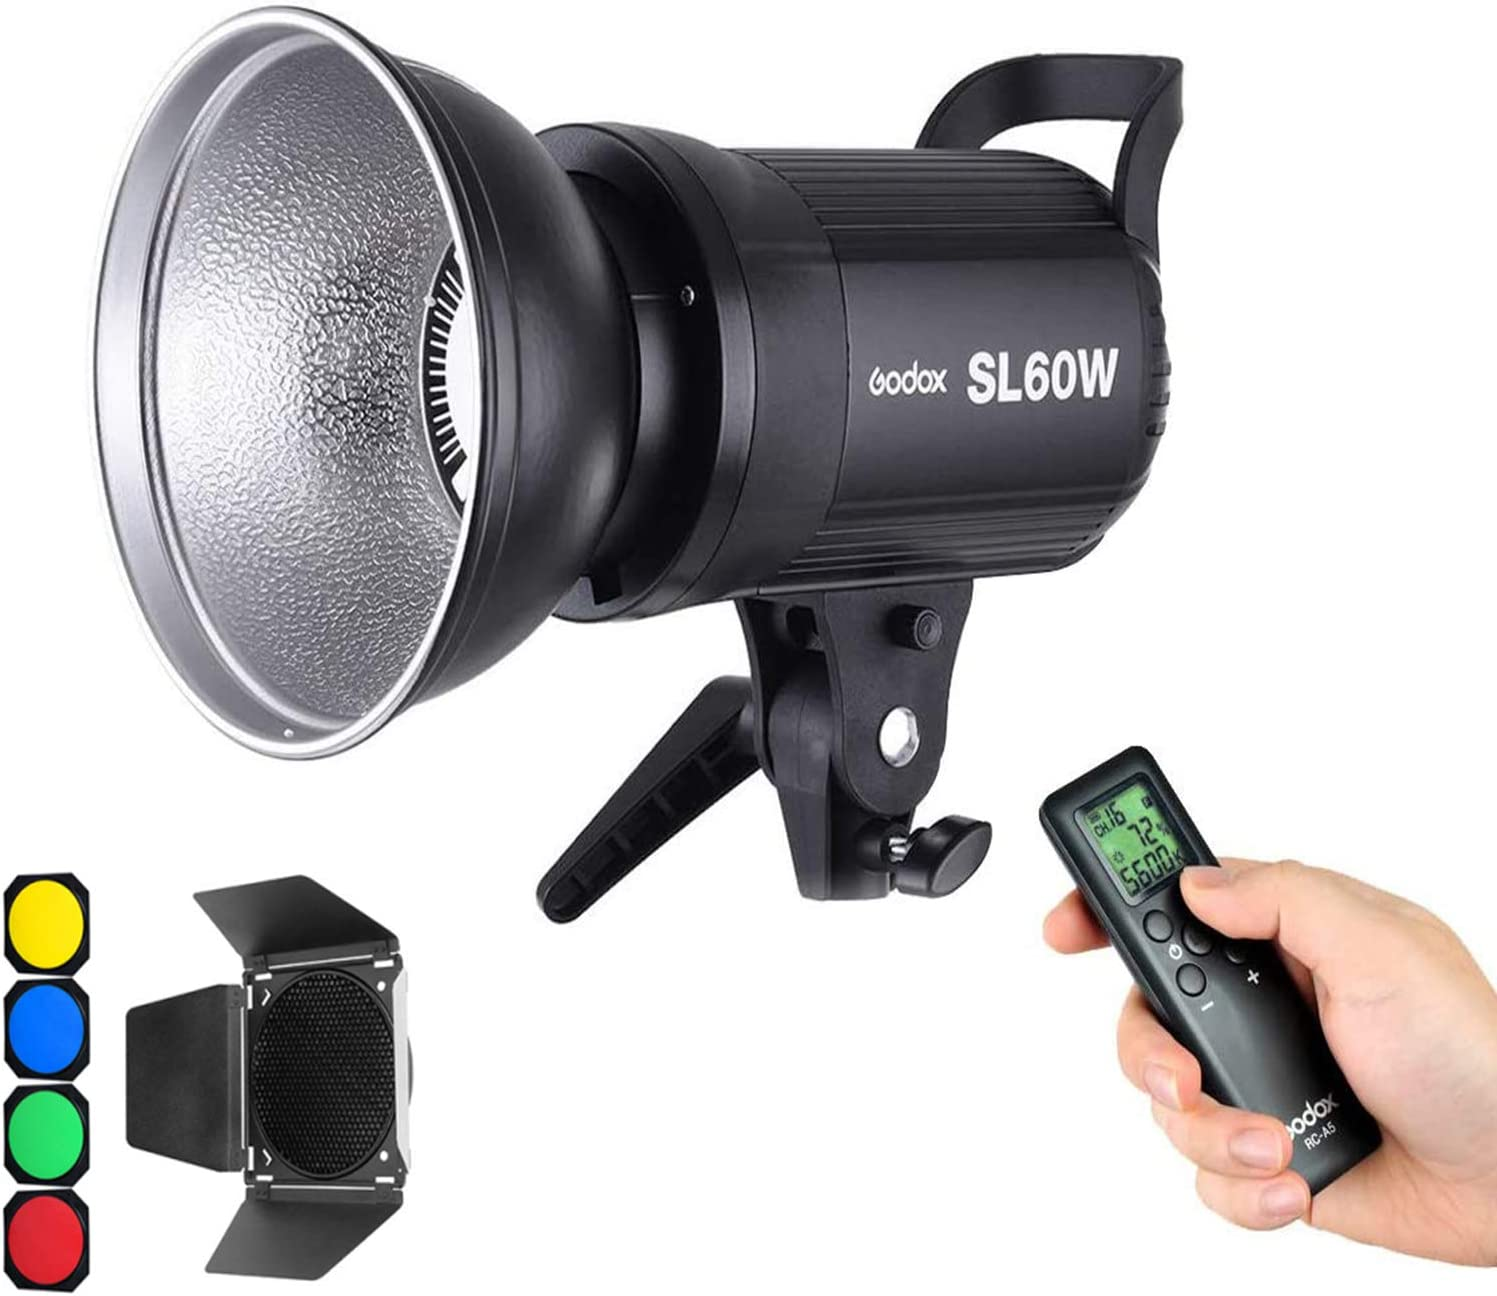 433MHz Grouping System Godox SL-60W Qa90 5600/±300K Bowens Mount Led Continuous Video Light,Wirelessly Adjust Brightness Upgrade Version LED Video Light,CRI95